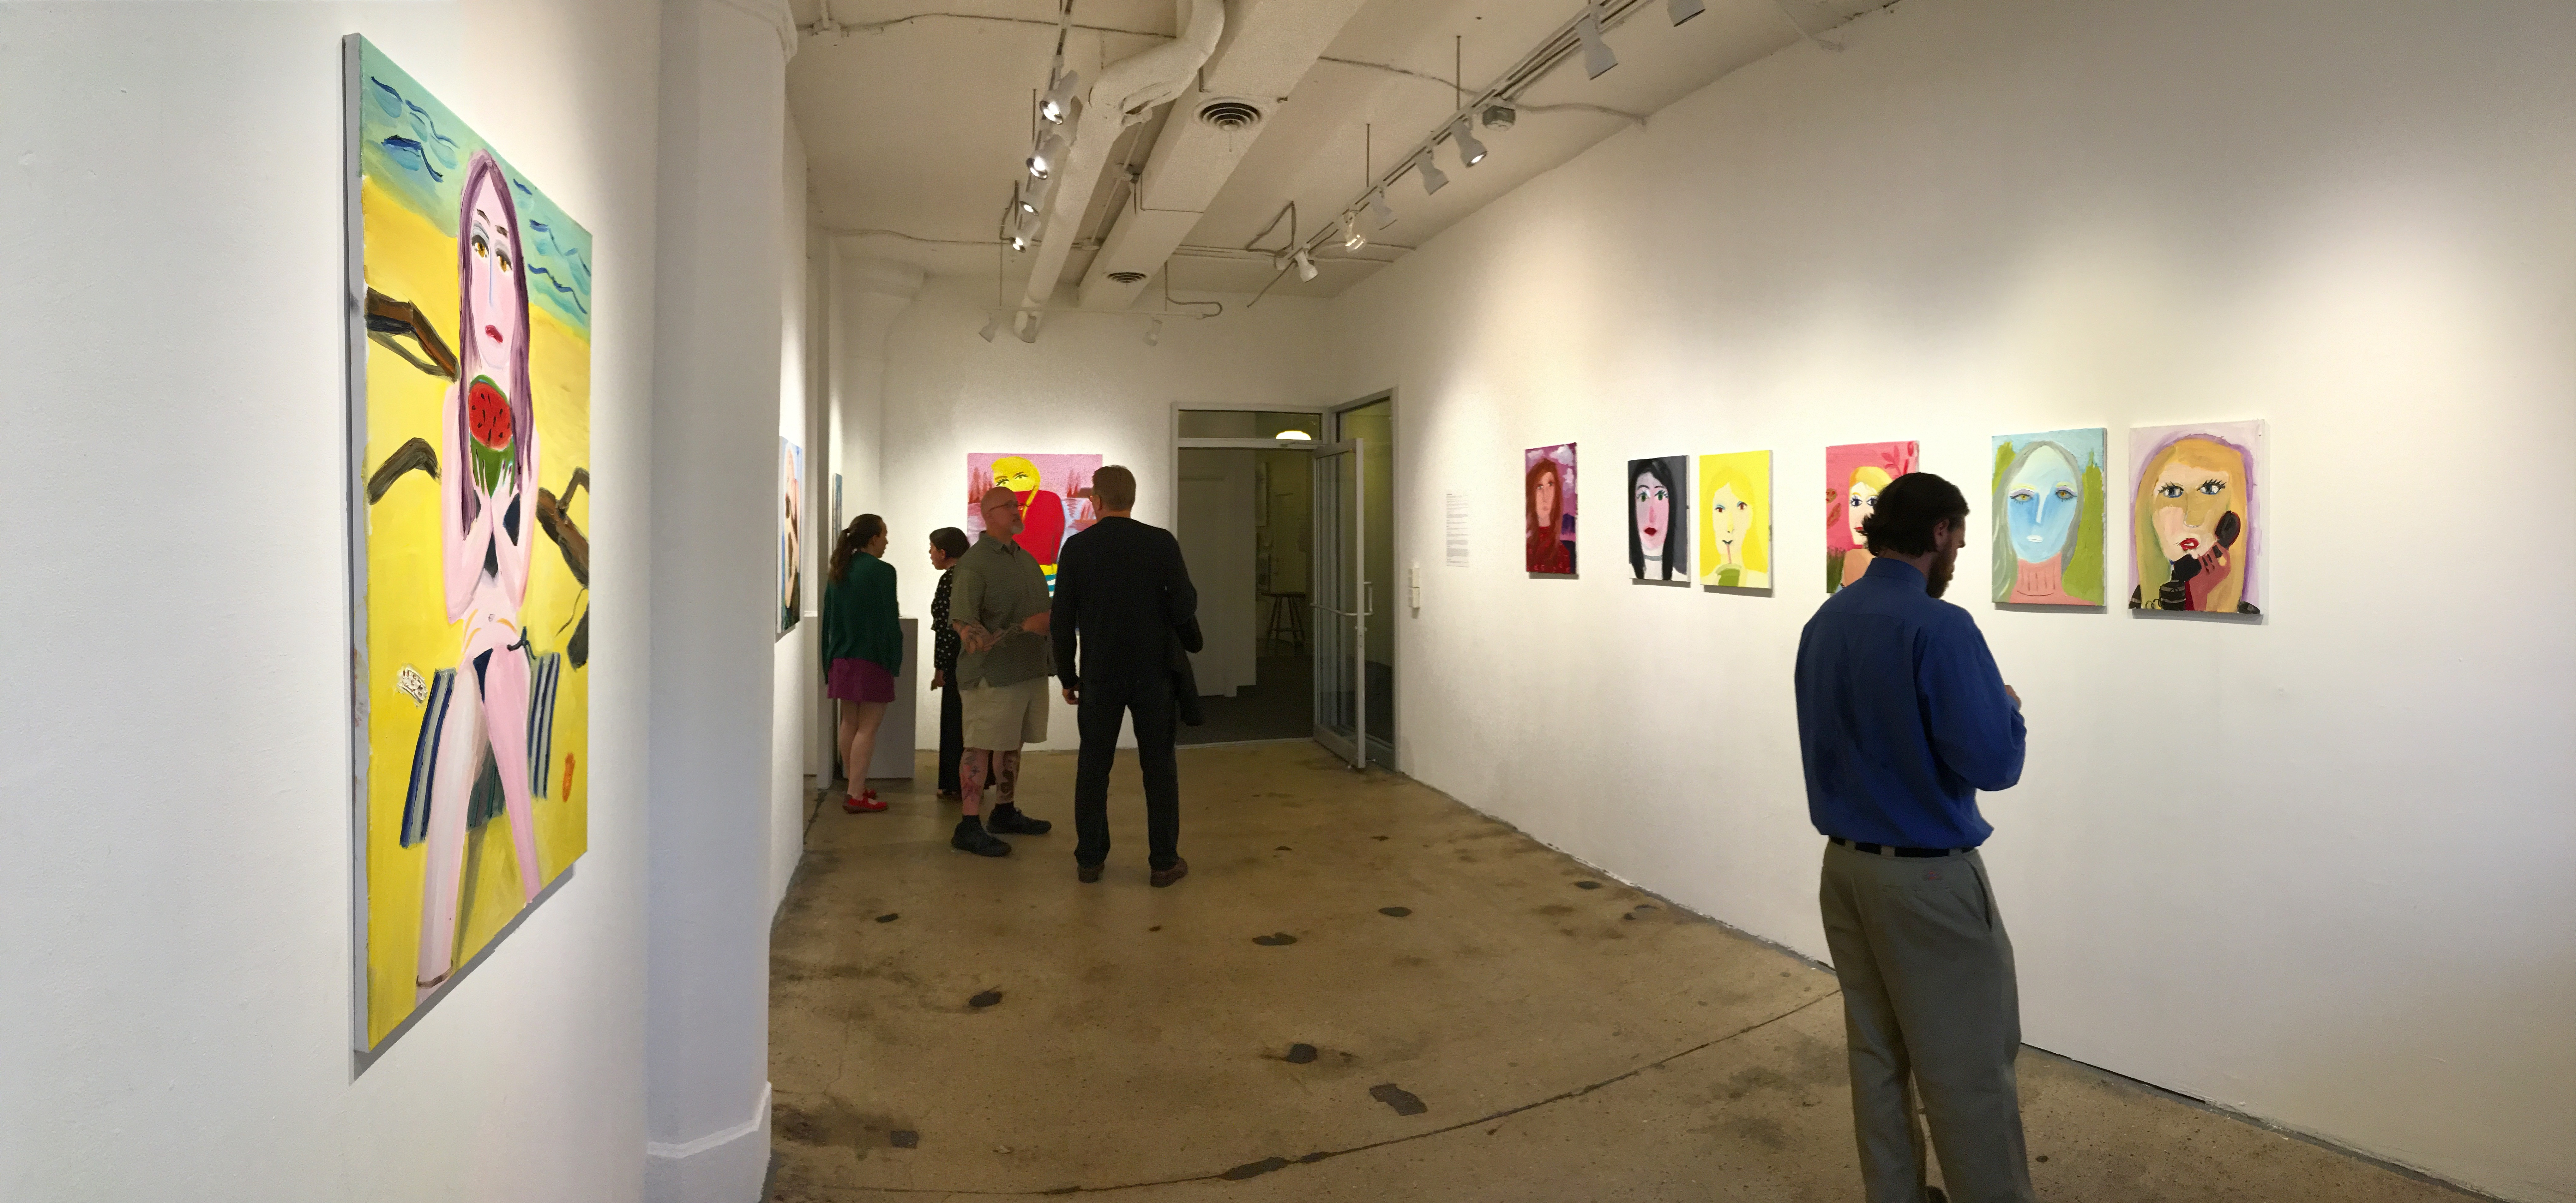 adult Aeries art gallery